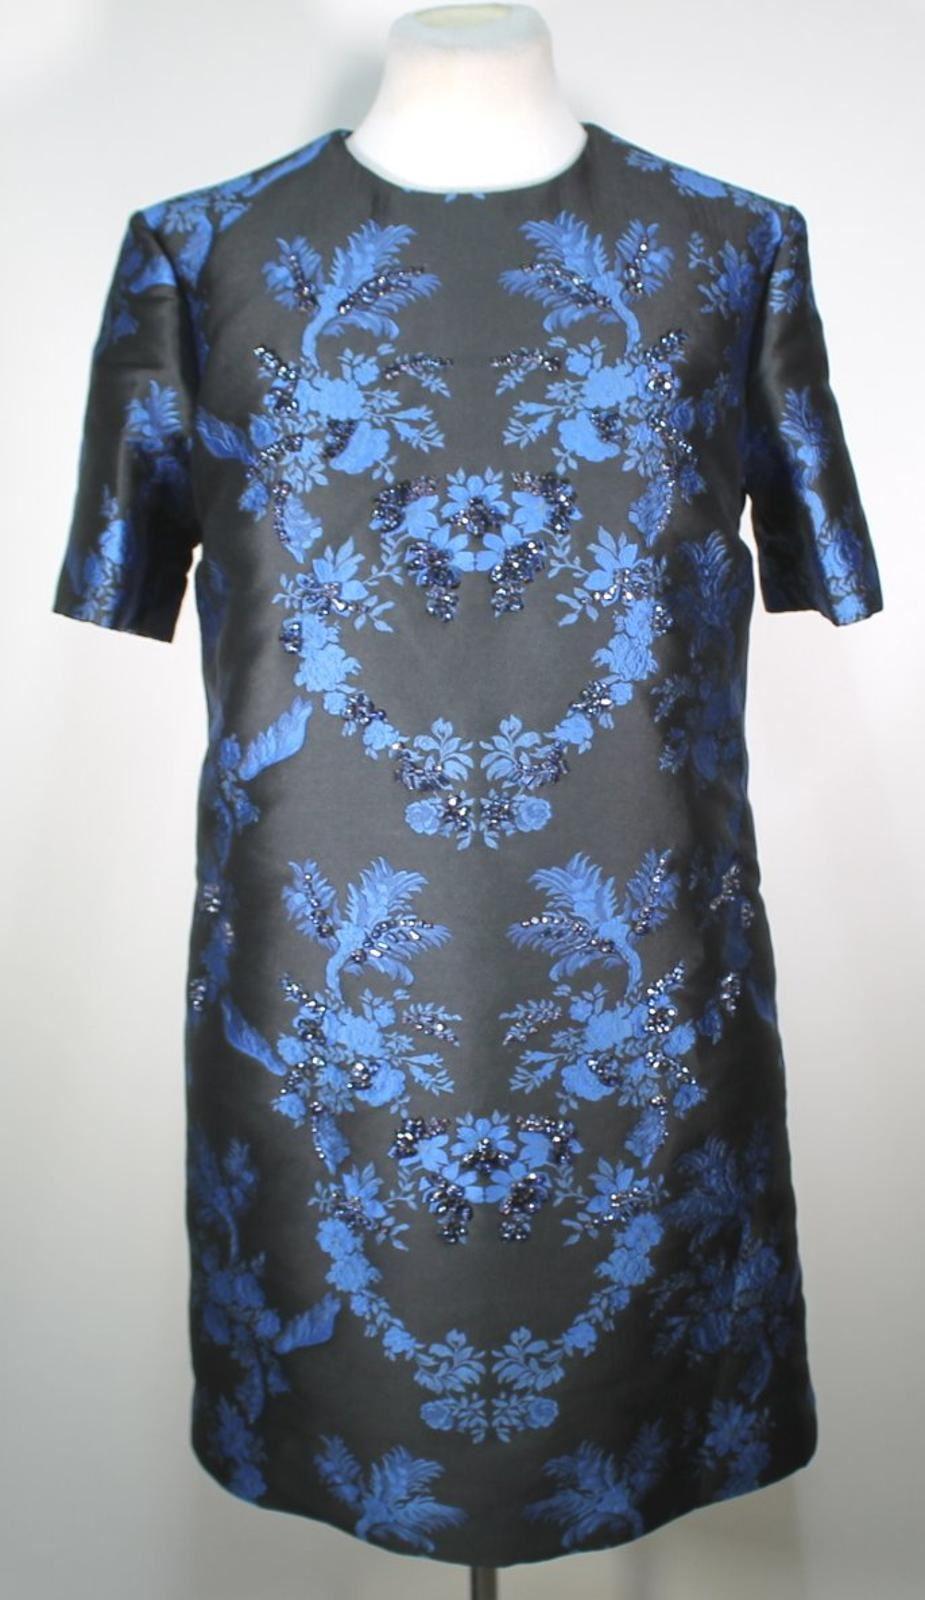 STELLA-MCCARTNEY-Ladies-Black-Blue-Laycie-Crystal-Brocade-Mini-Dress-UK12-BNWT